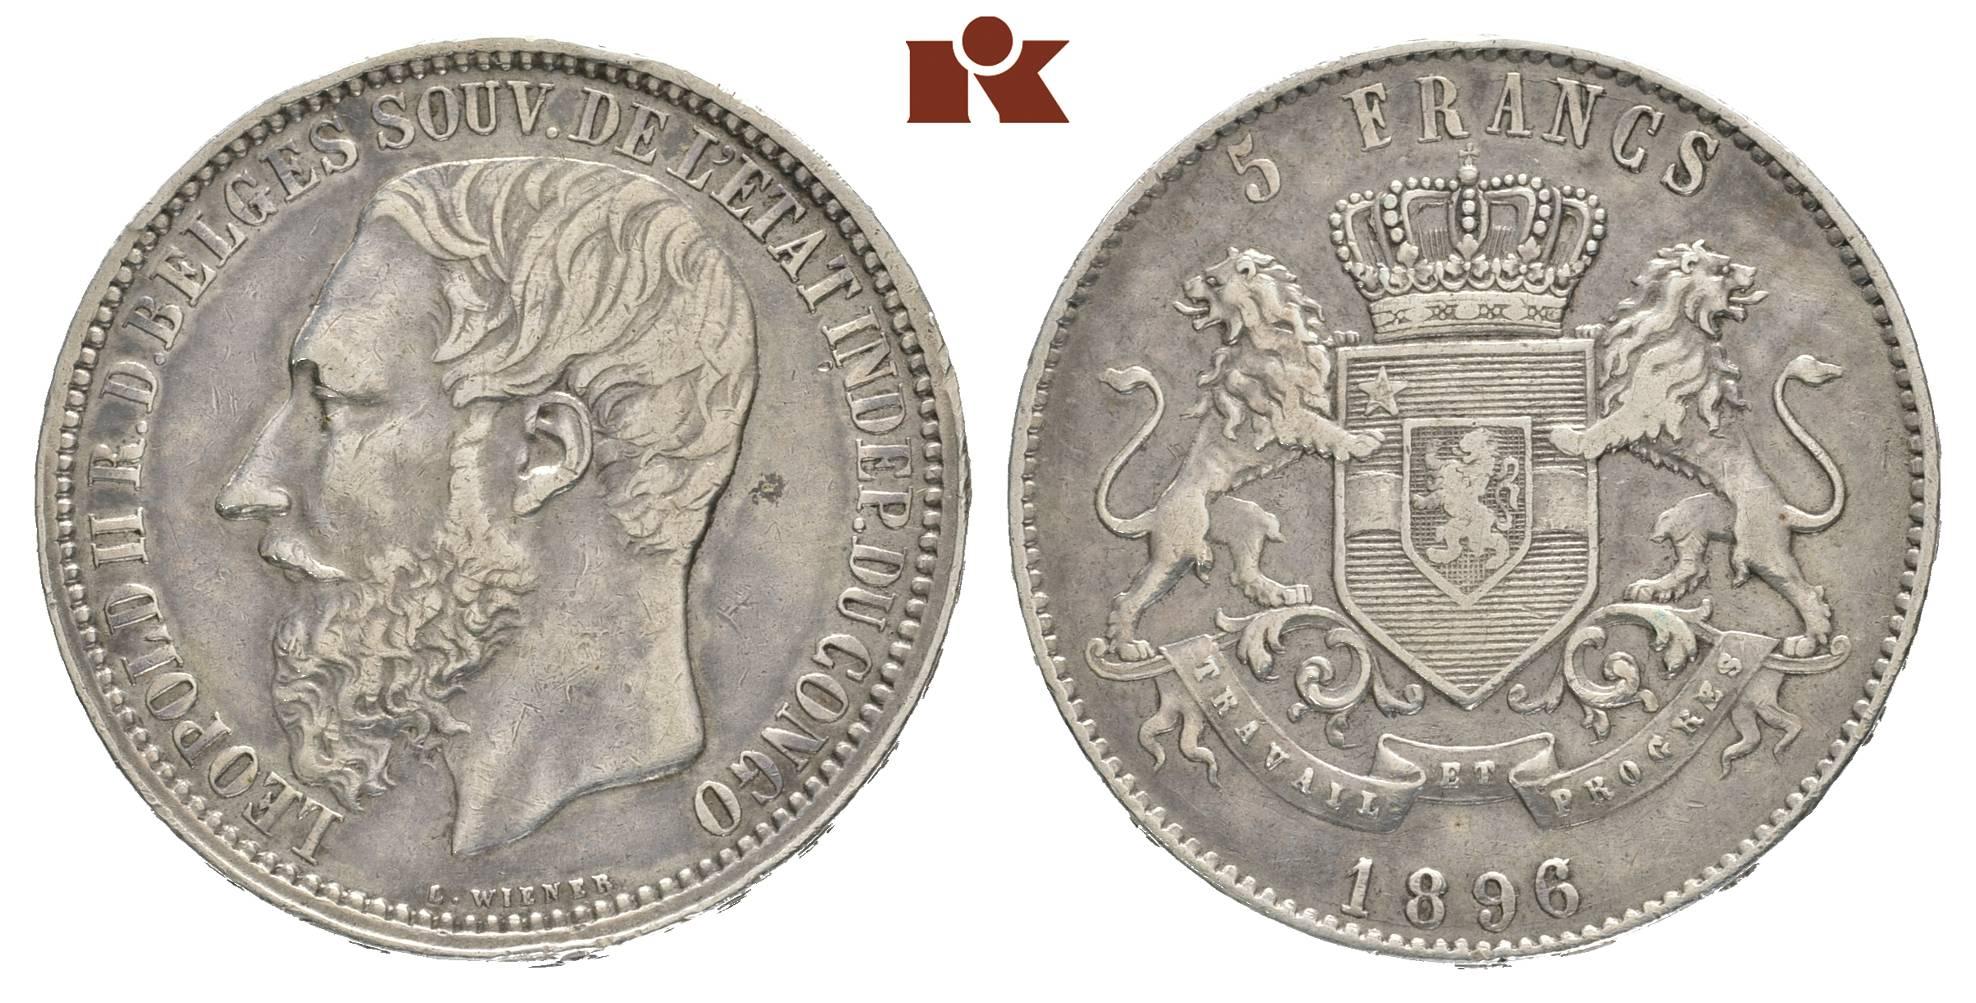 Leopold Ii 1865 1909 5 Francs 1896 Jahreszahl Im Stempel Aus